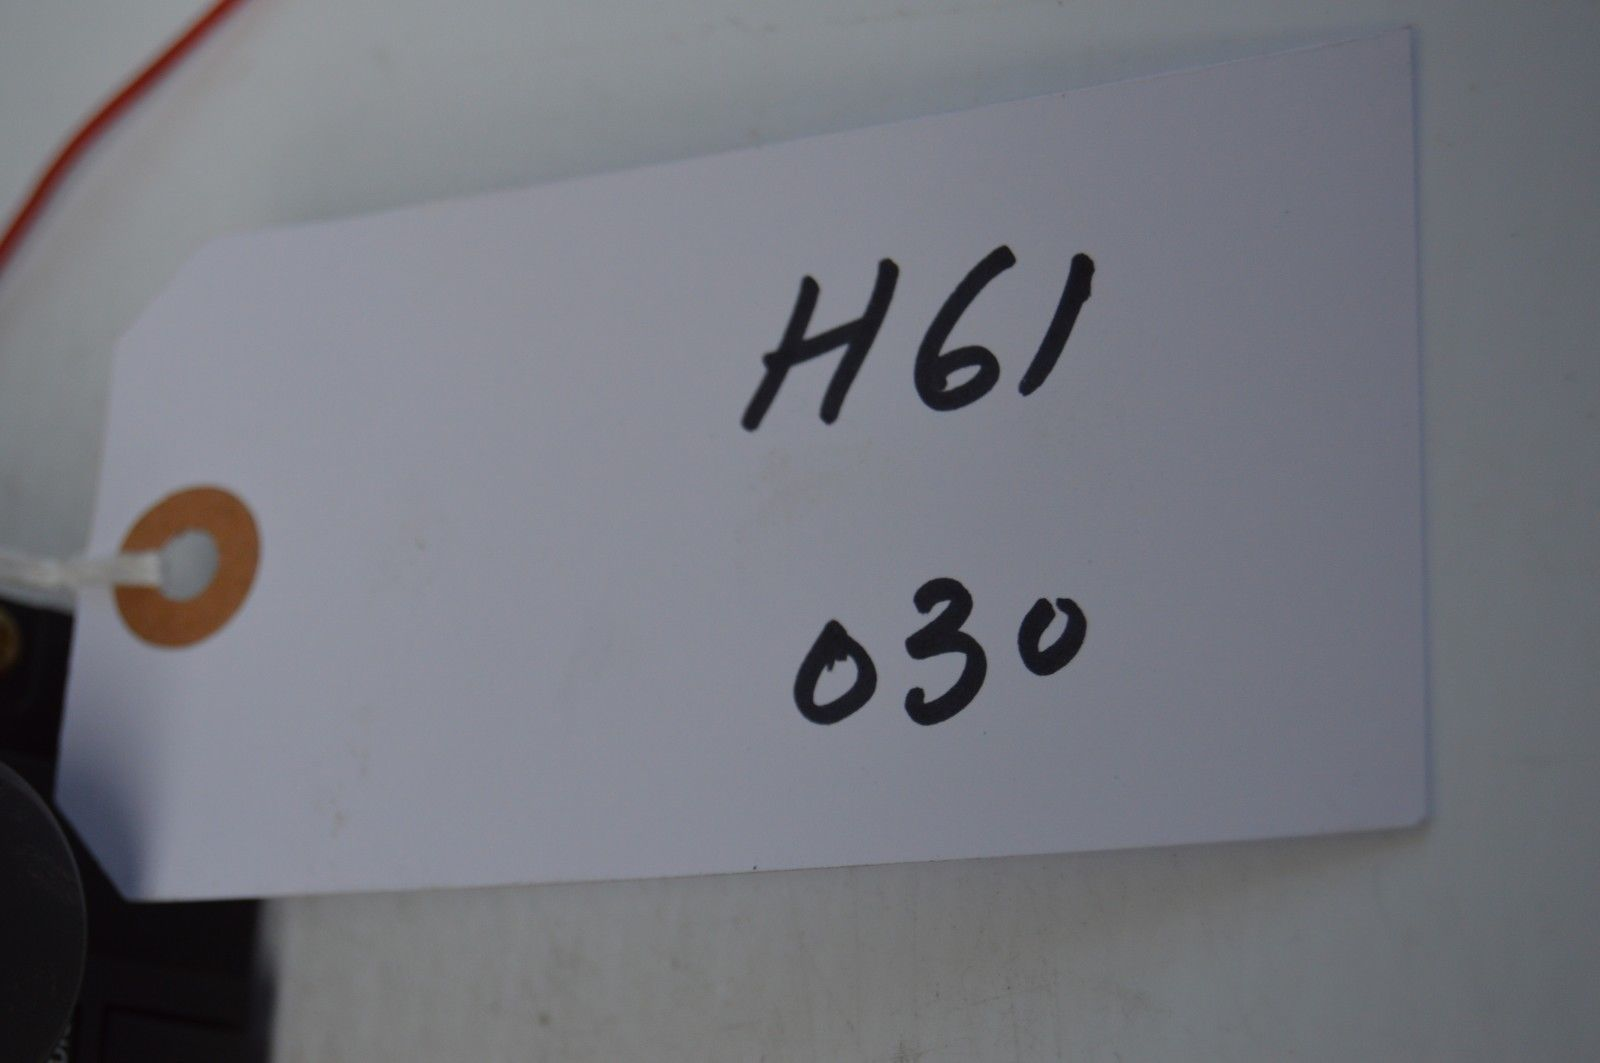 2005-2010 CHRYSLER 300 RADIO CD PLAYER OEM RADIO P05064030AN TESTED H61#030 image 8